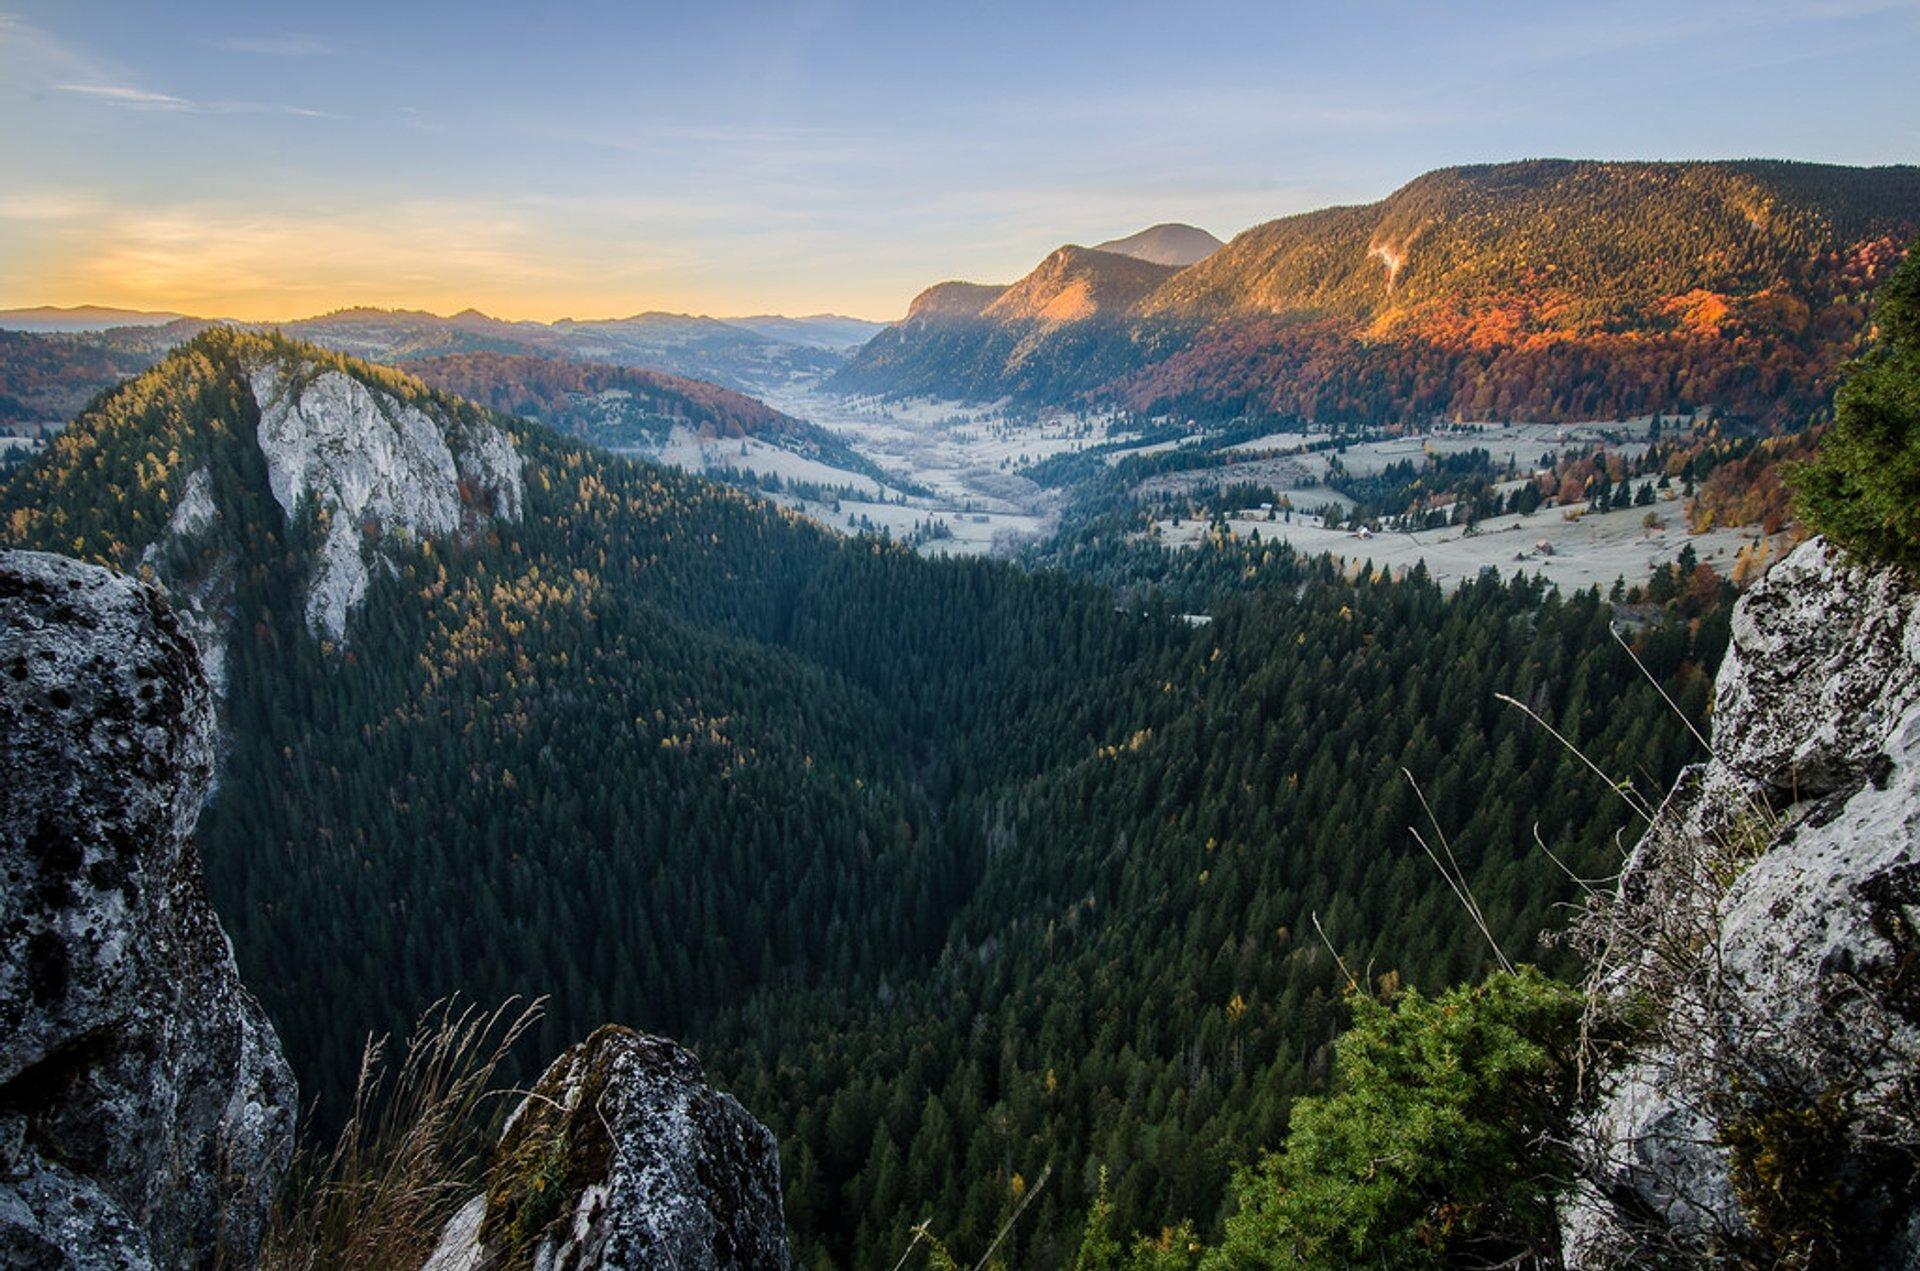 Raul Bicajel valley, Transylvania 2019